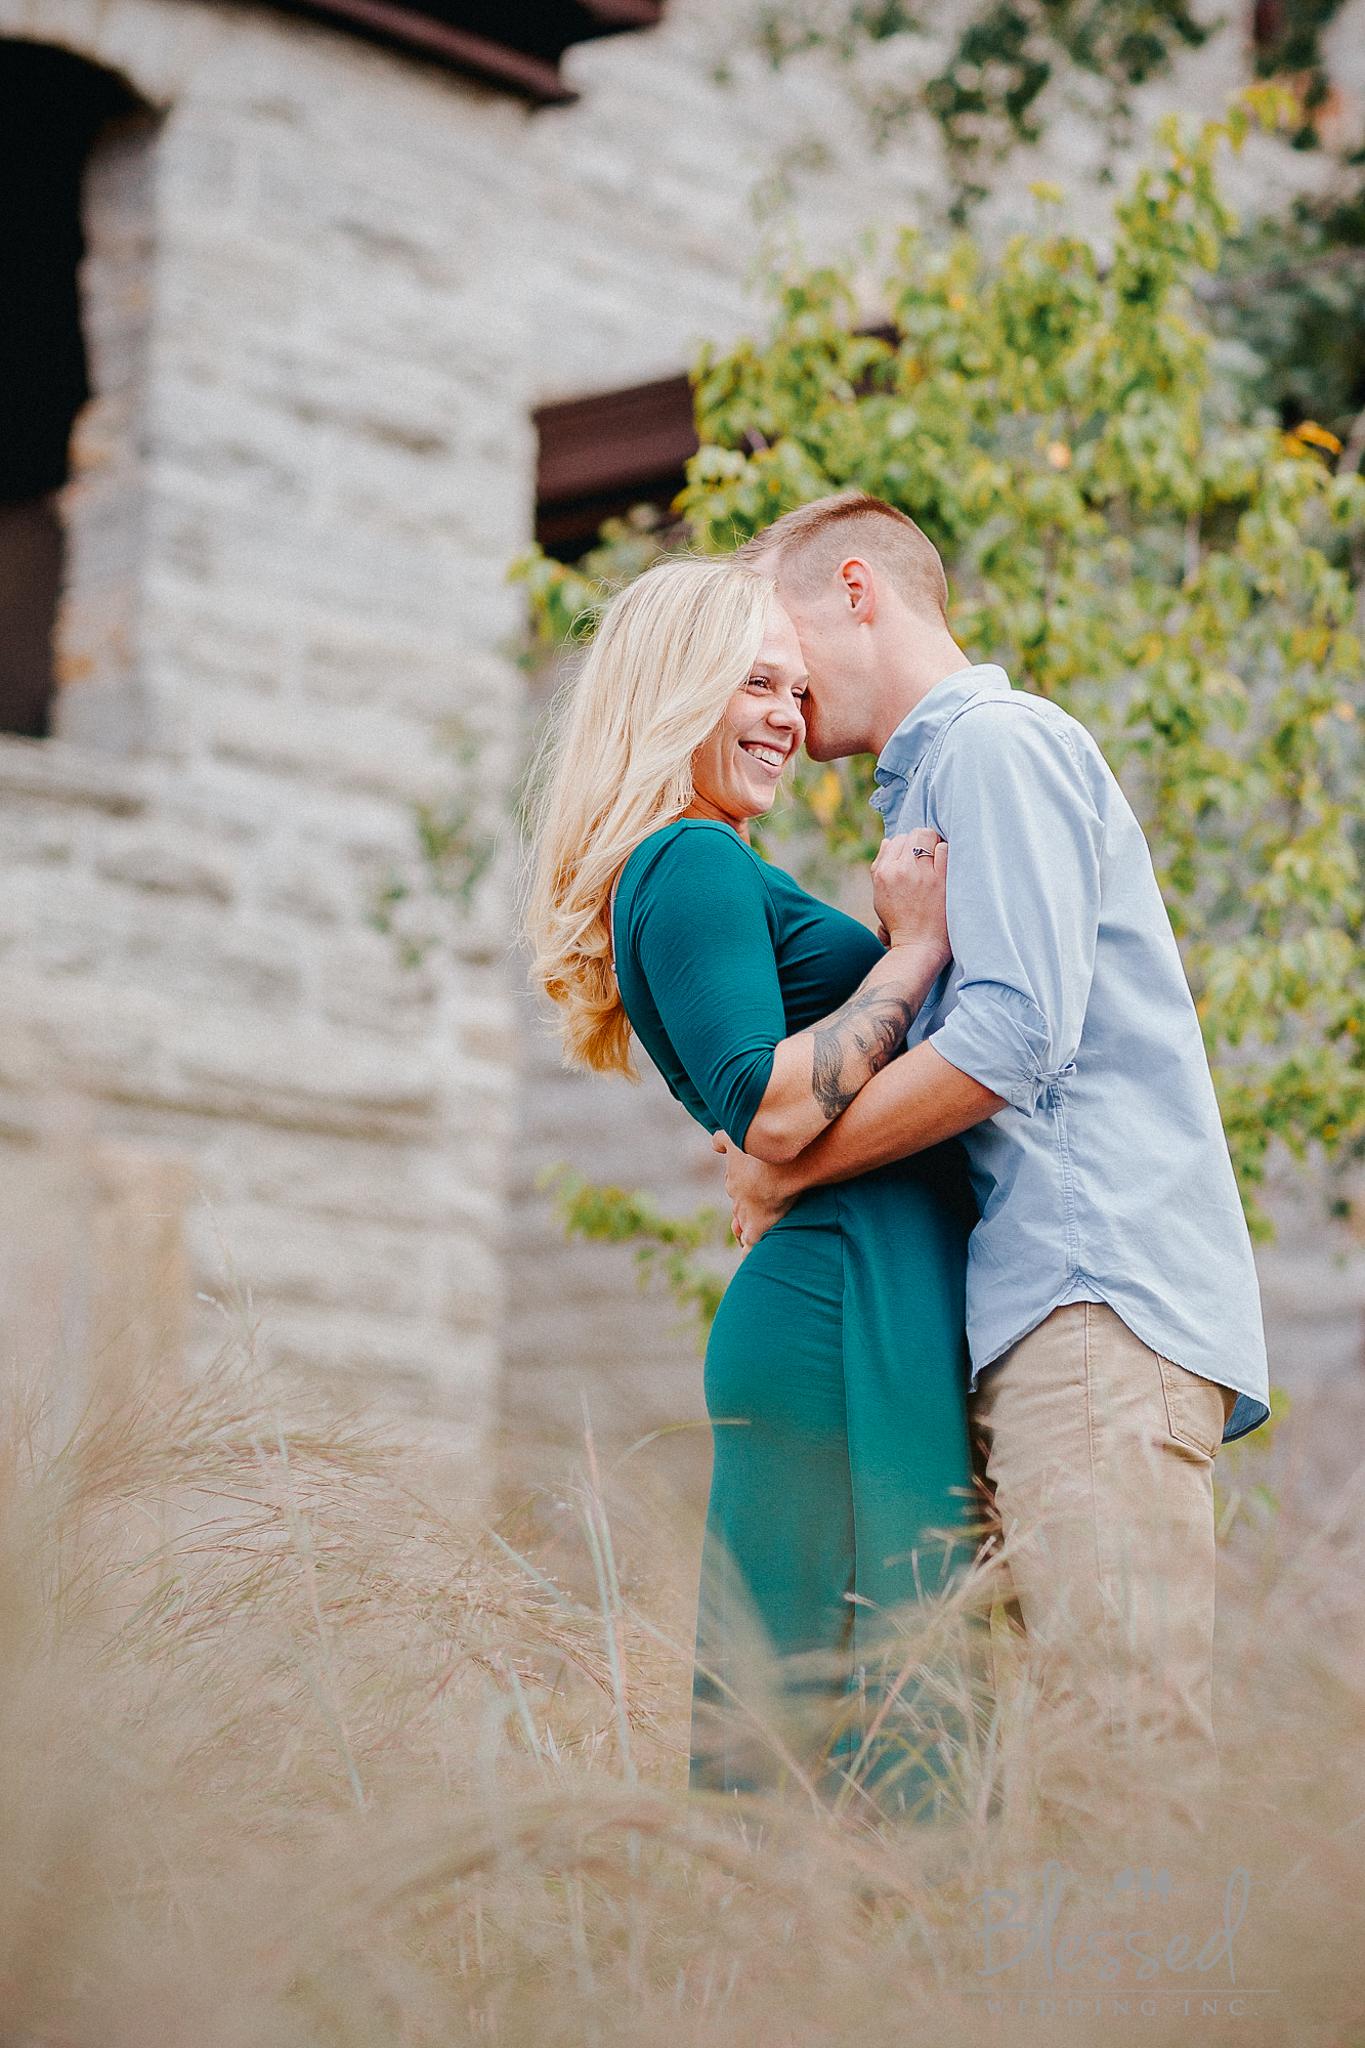 Destination Wedding Photography Minnesota By Blessed Wedding Photographers-2.jpg